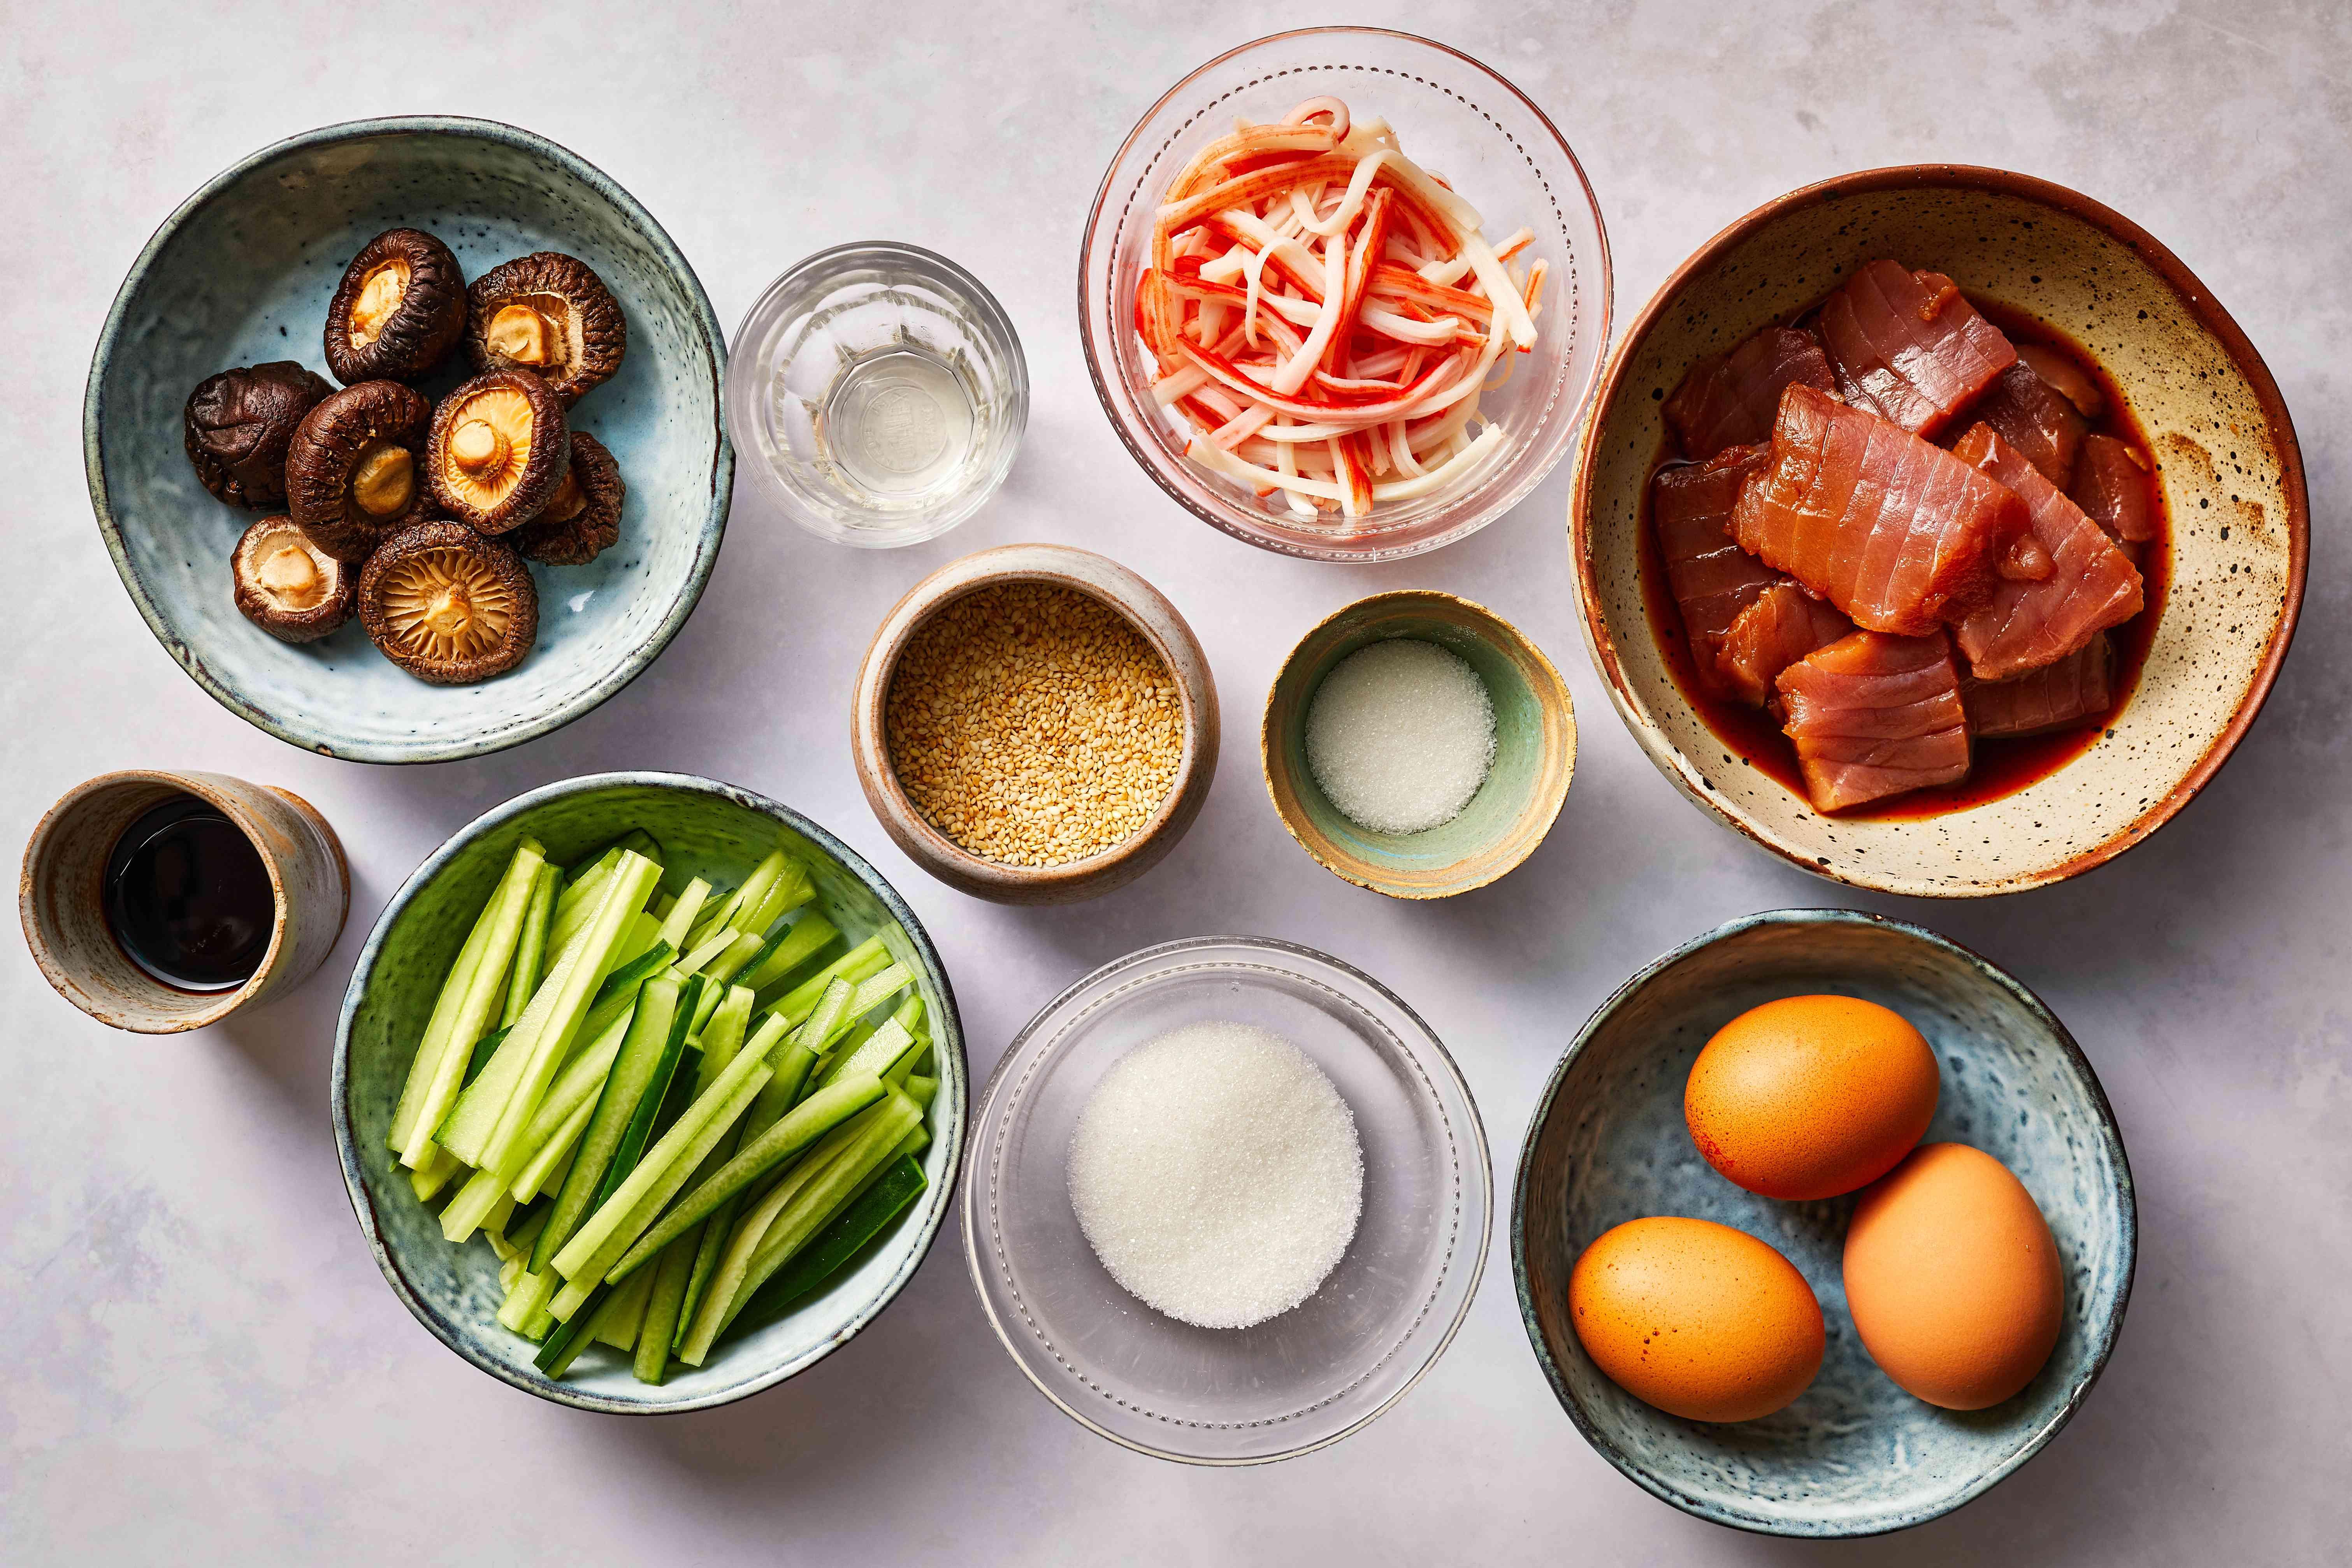 Japanese Chirashizushi ingredients